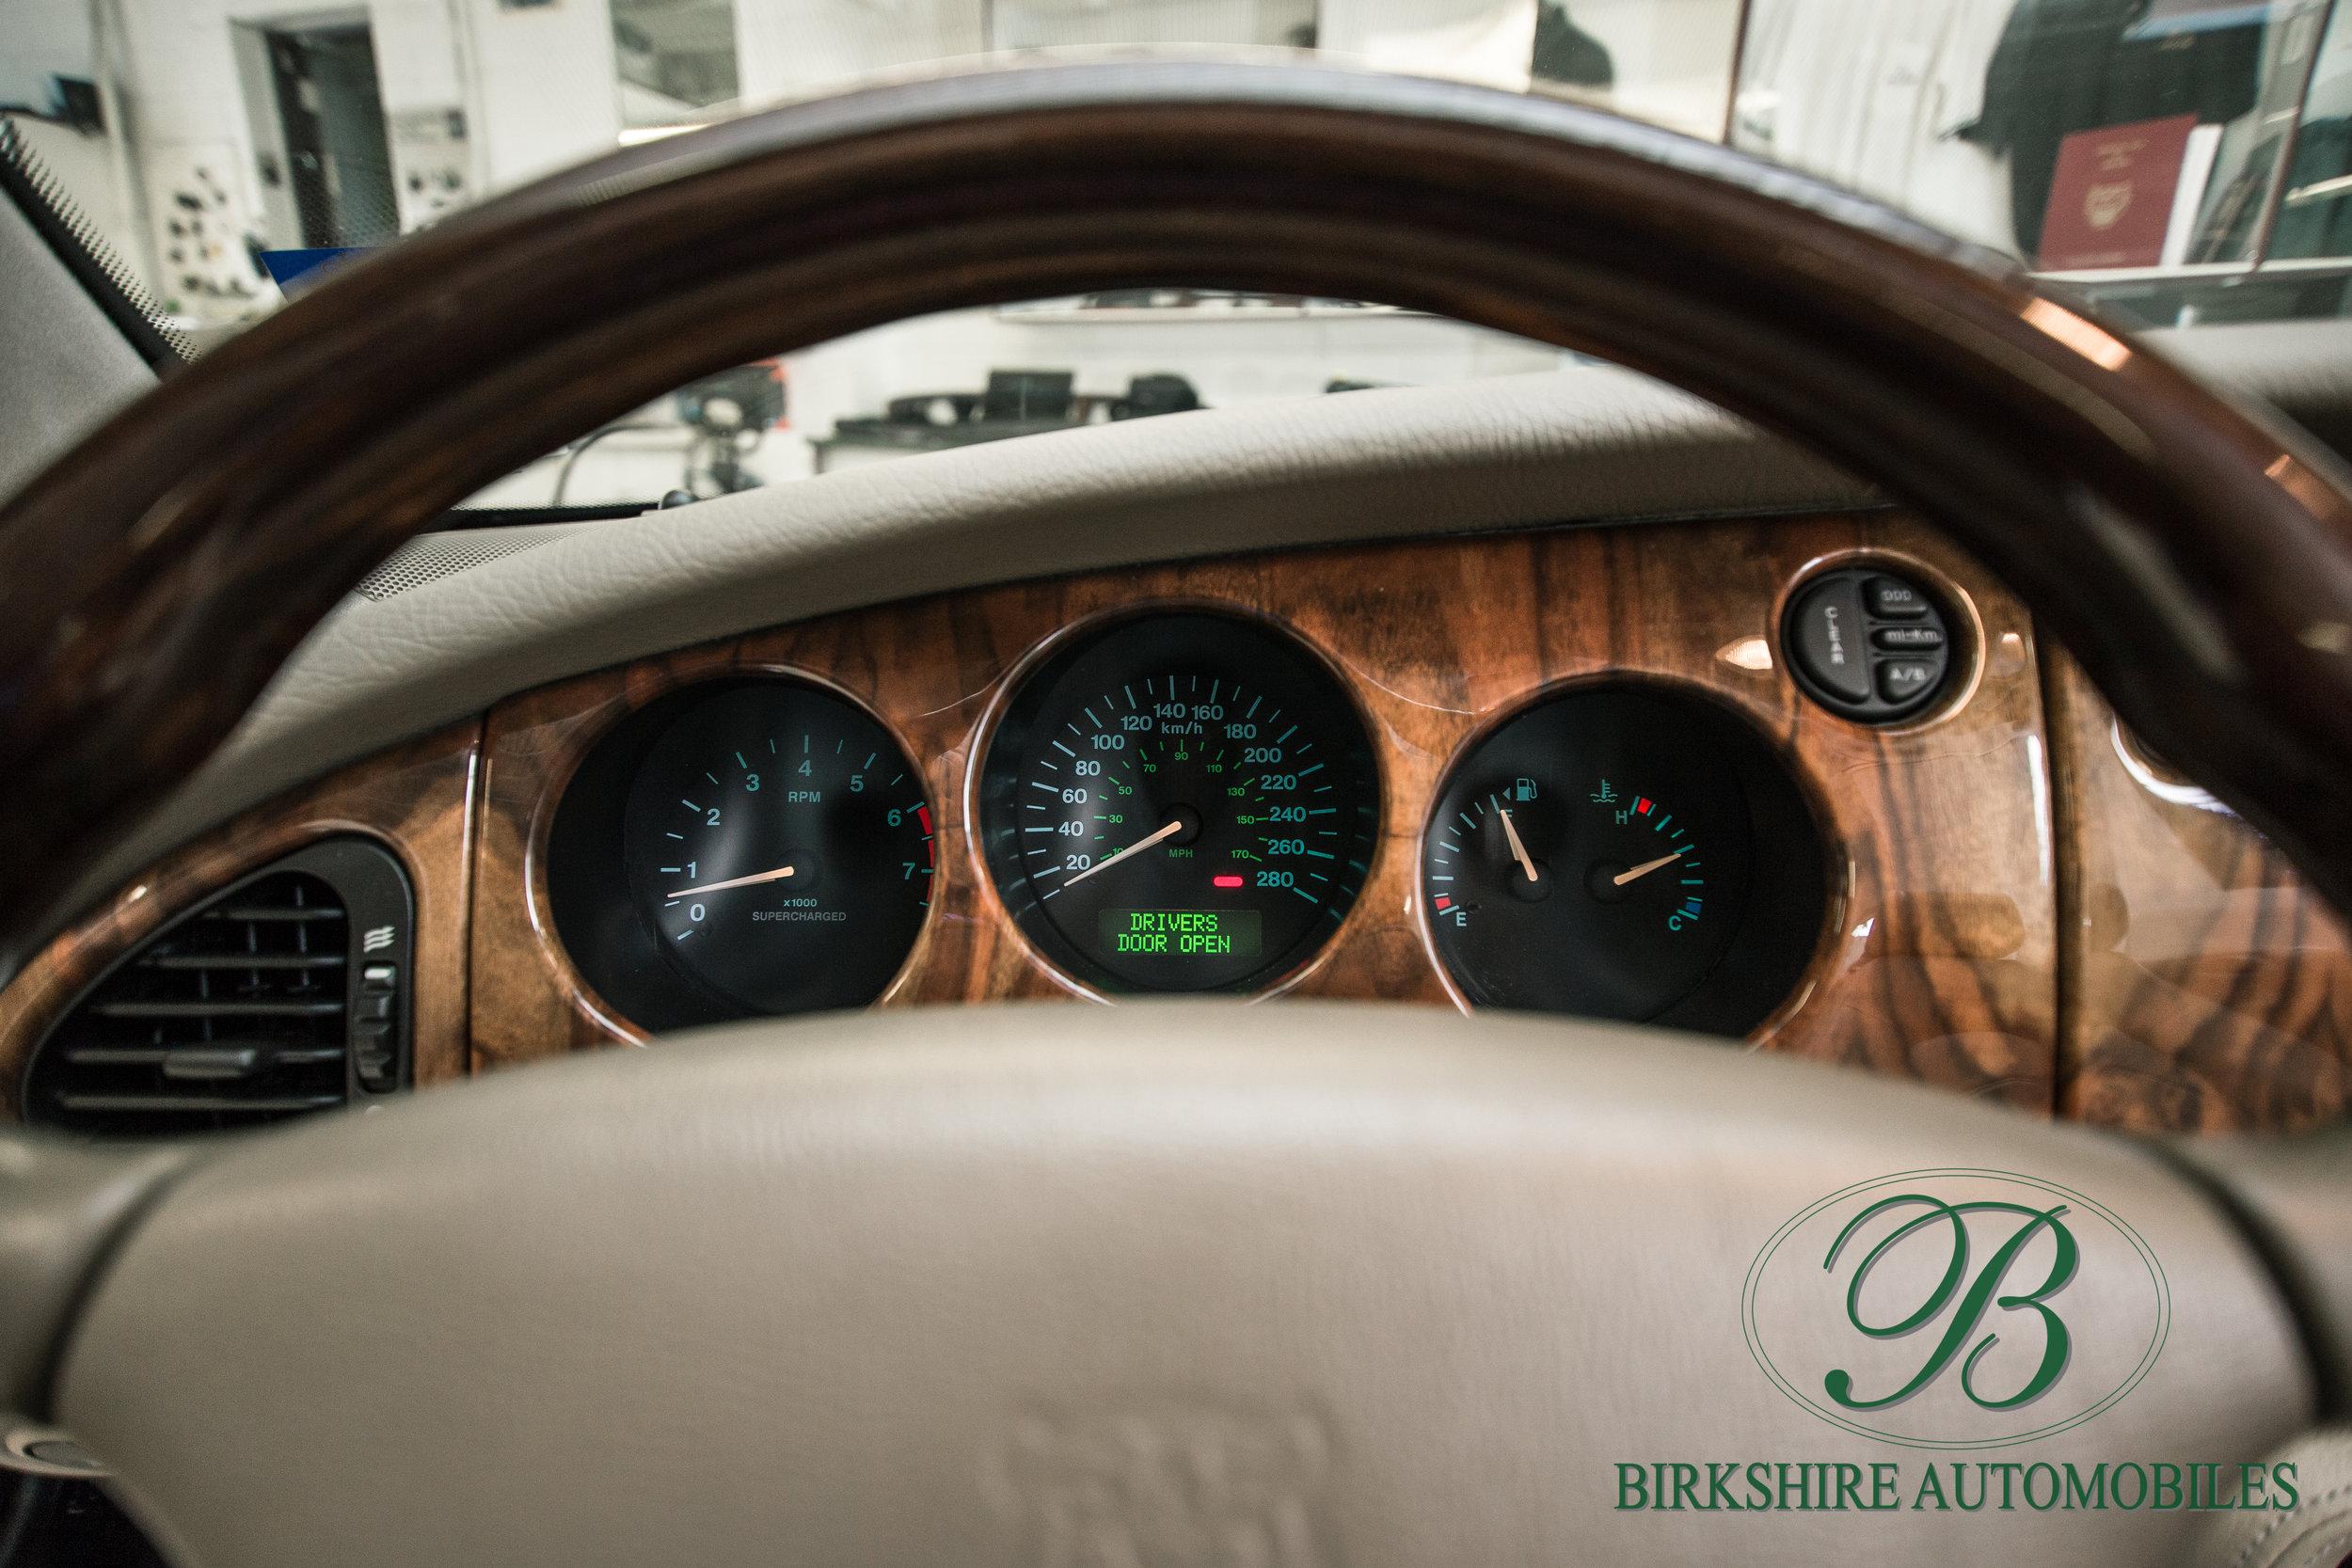 Birkshire Automobiles-131.jpg